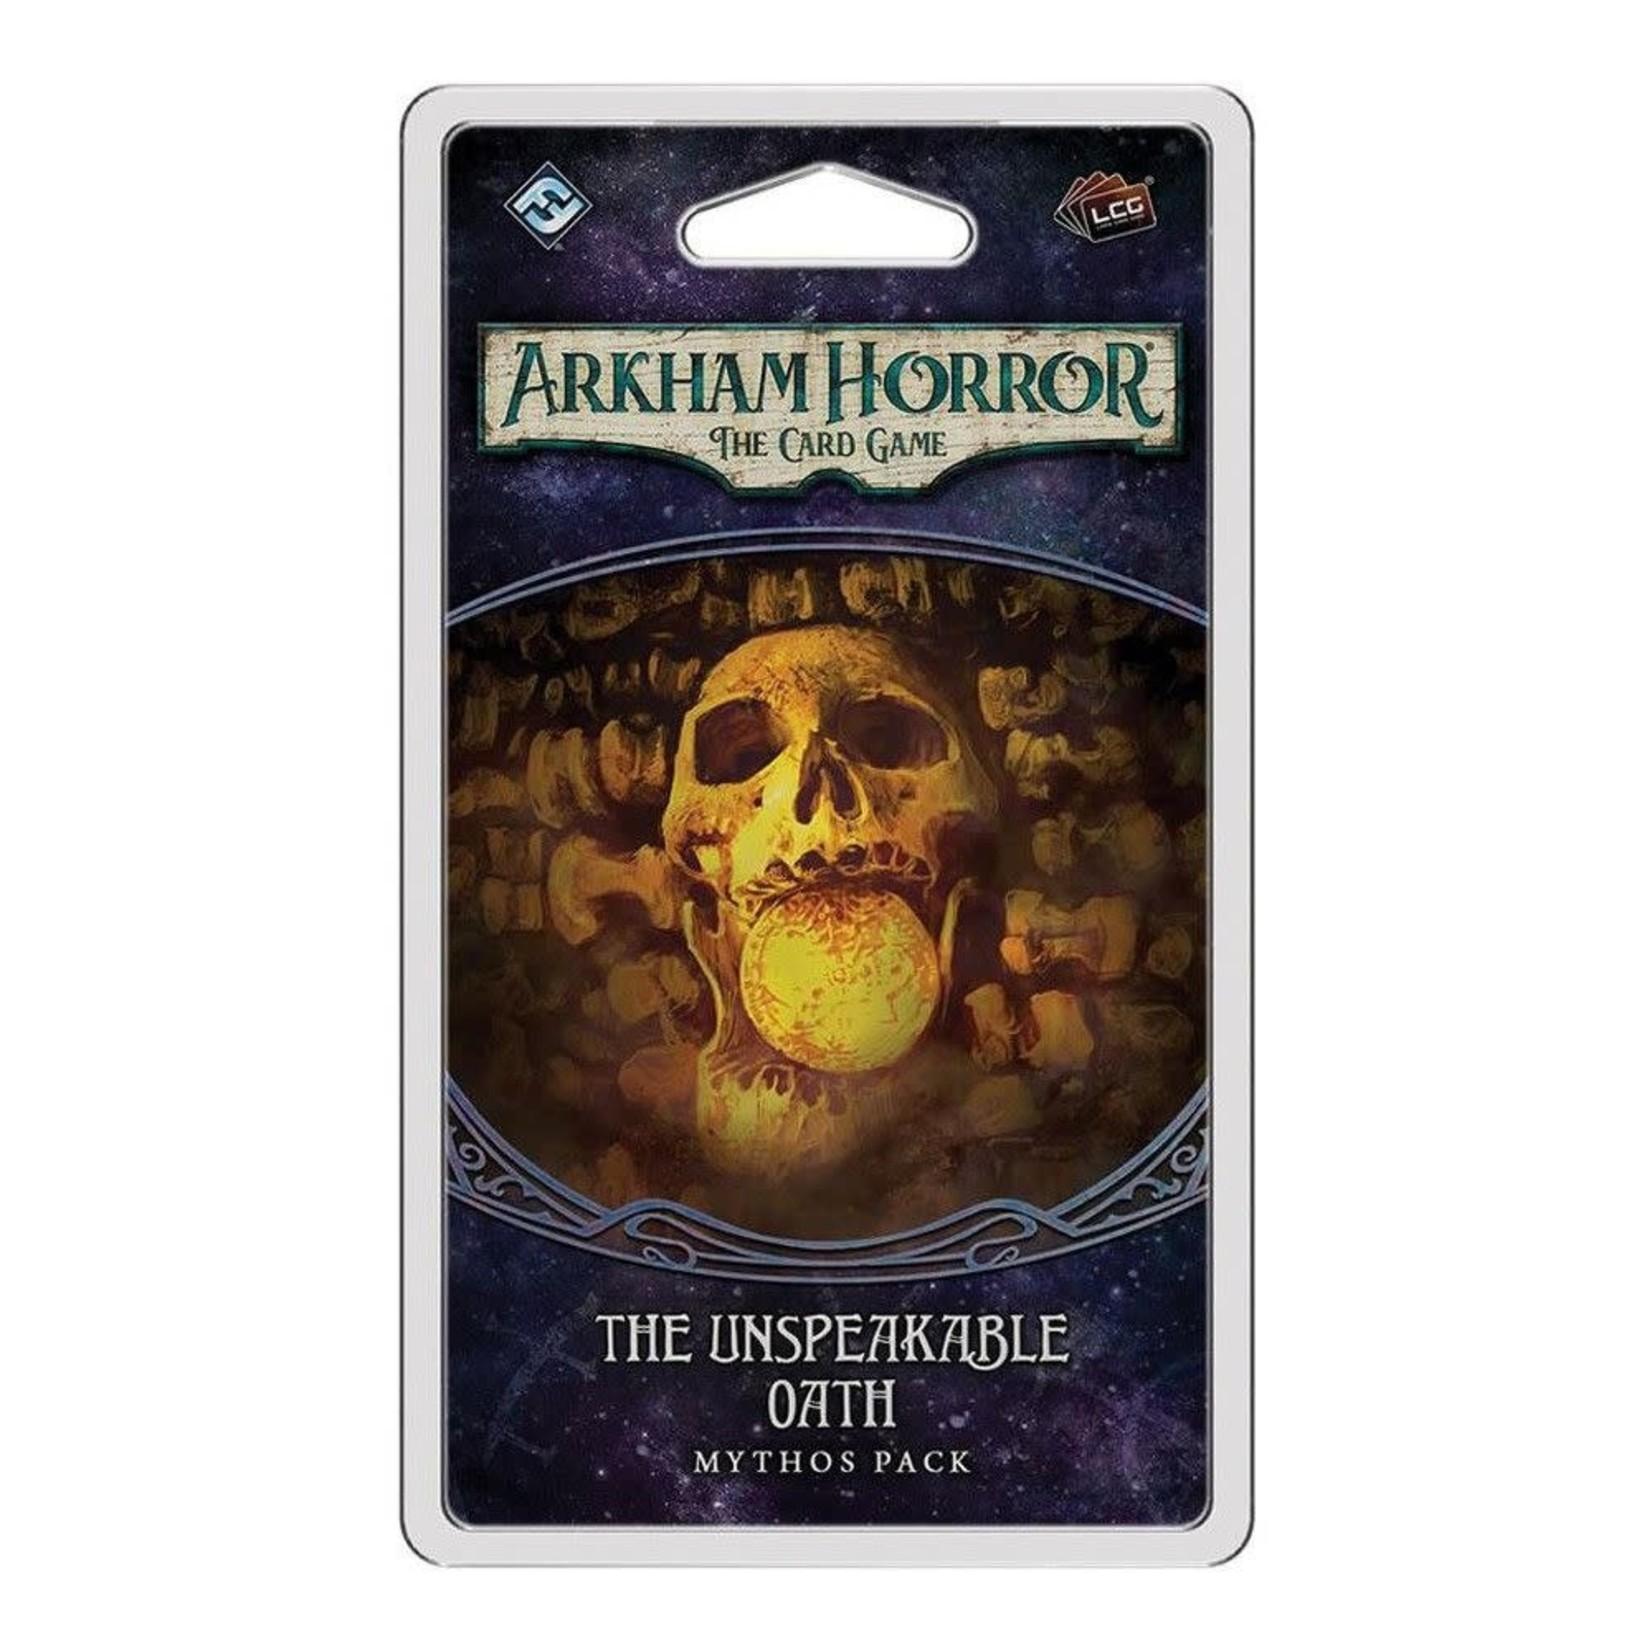 Arkham Horror LCG: The Unspeakable Oath Mythos Pack